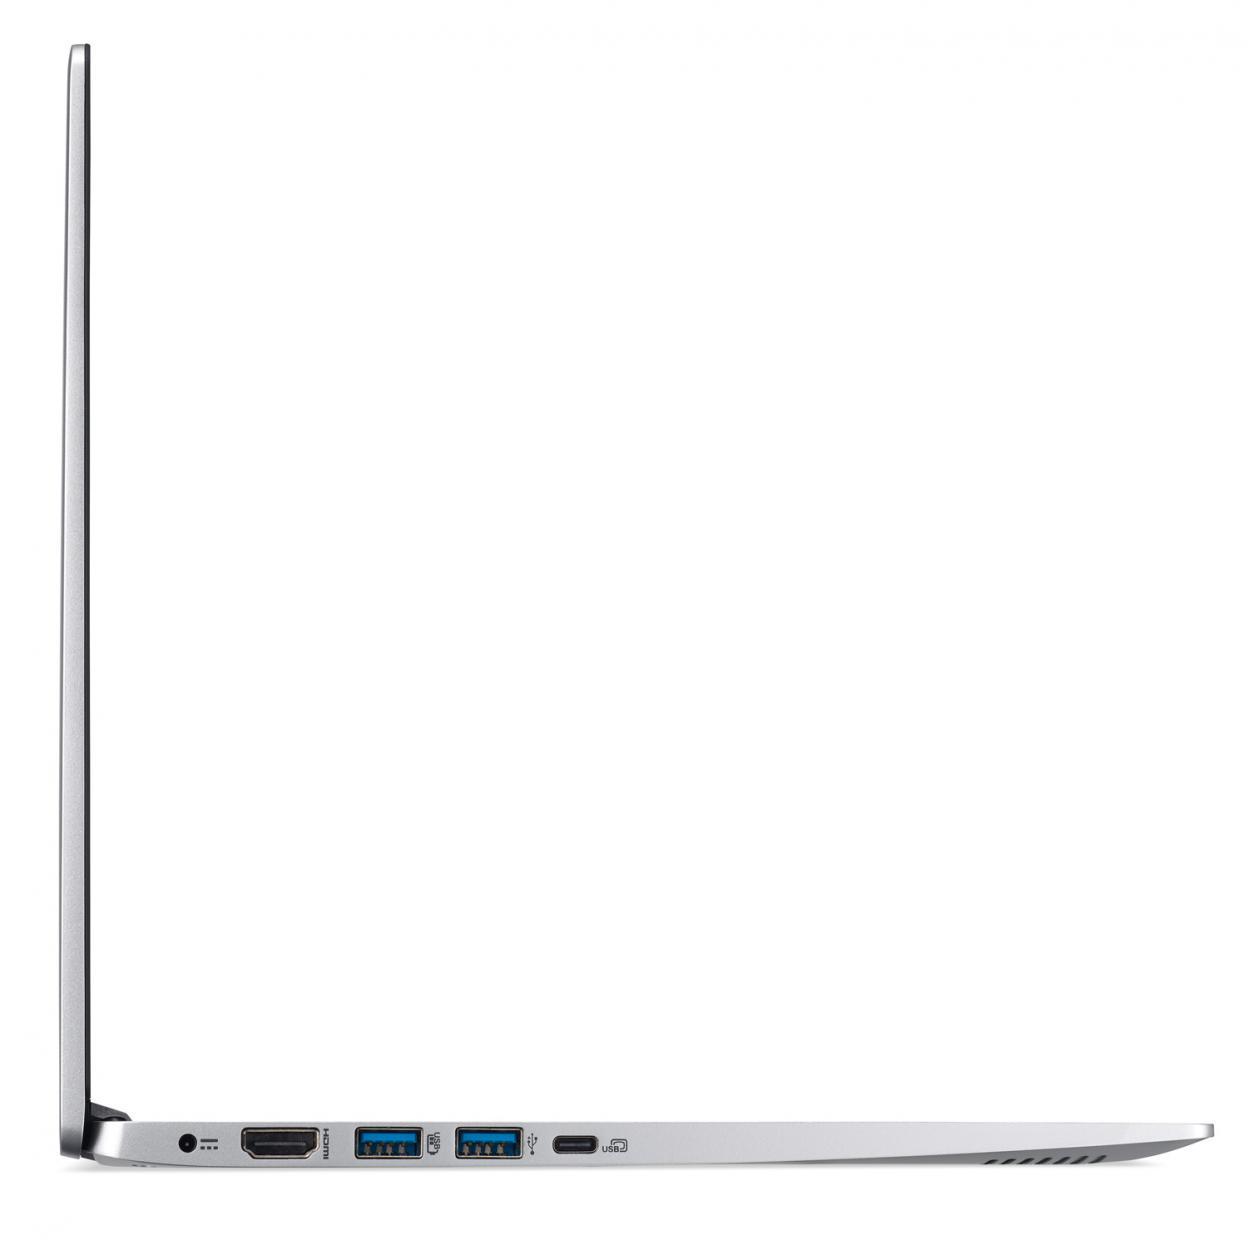 Ordinateur portable Acer Swift 5 SF515-51T-54AF Argent Tactile - photo 6